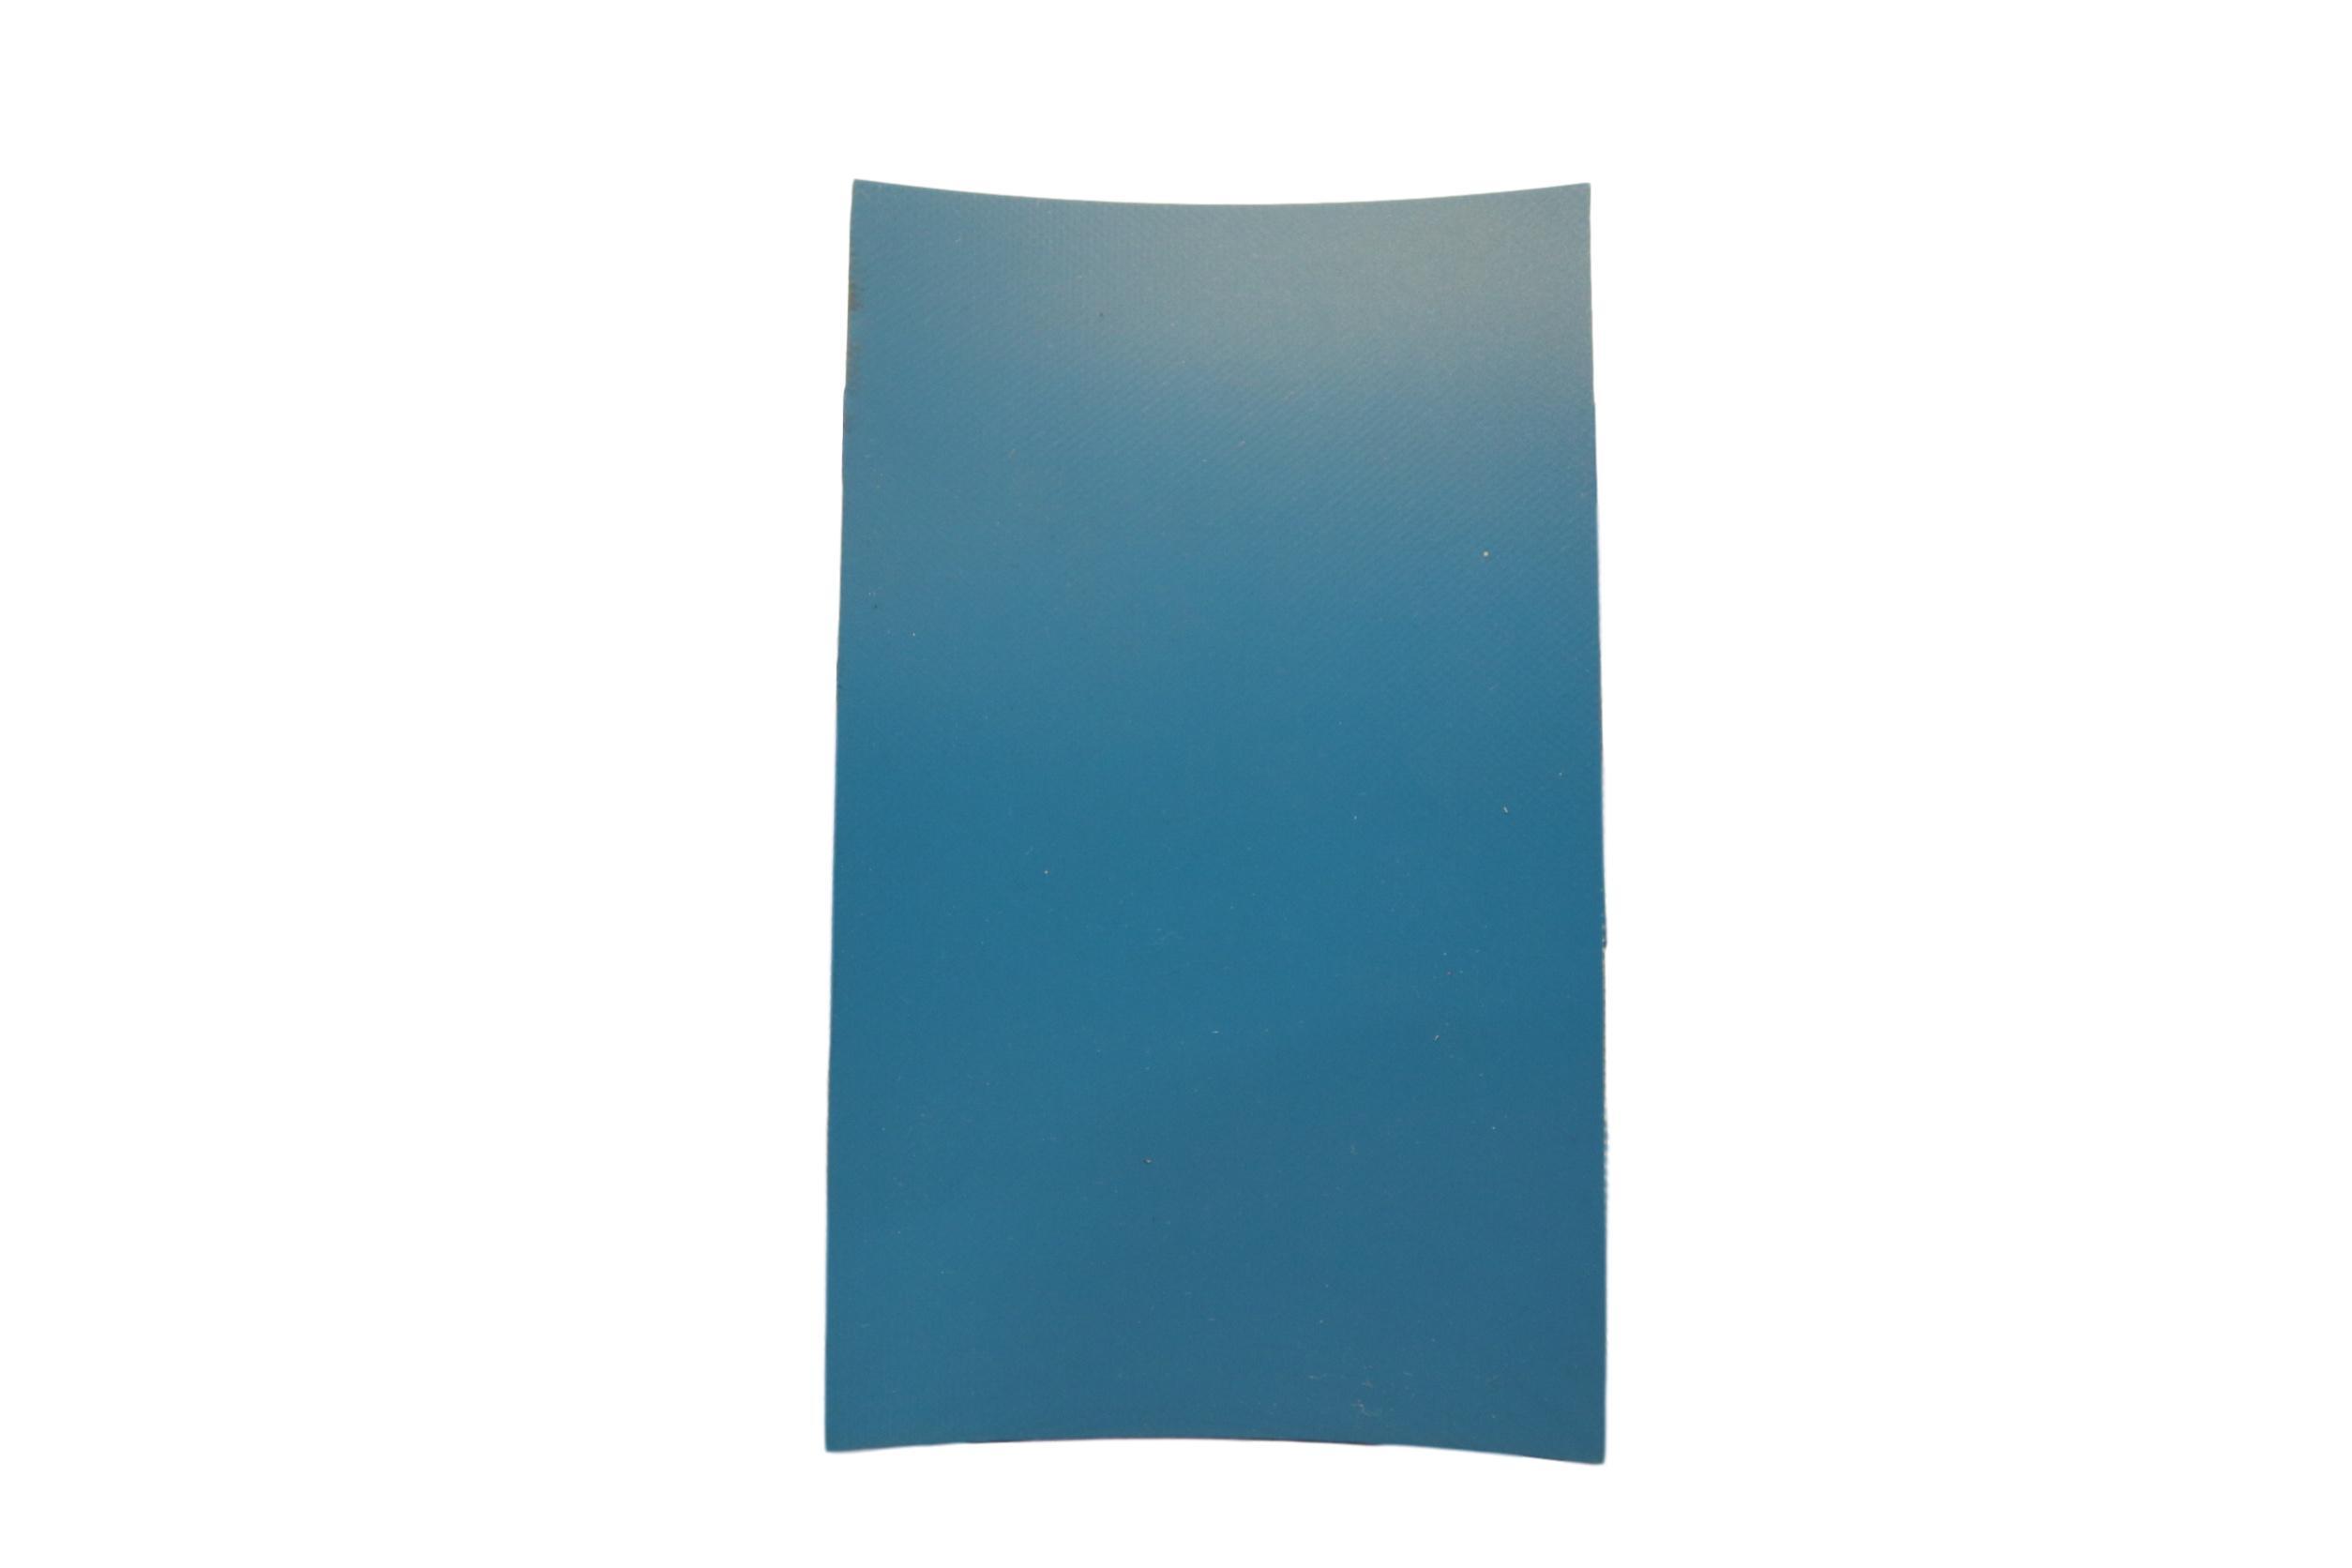 Conveyor Belting Blue PVC 2 PLY Fabric Back 2.0mm